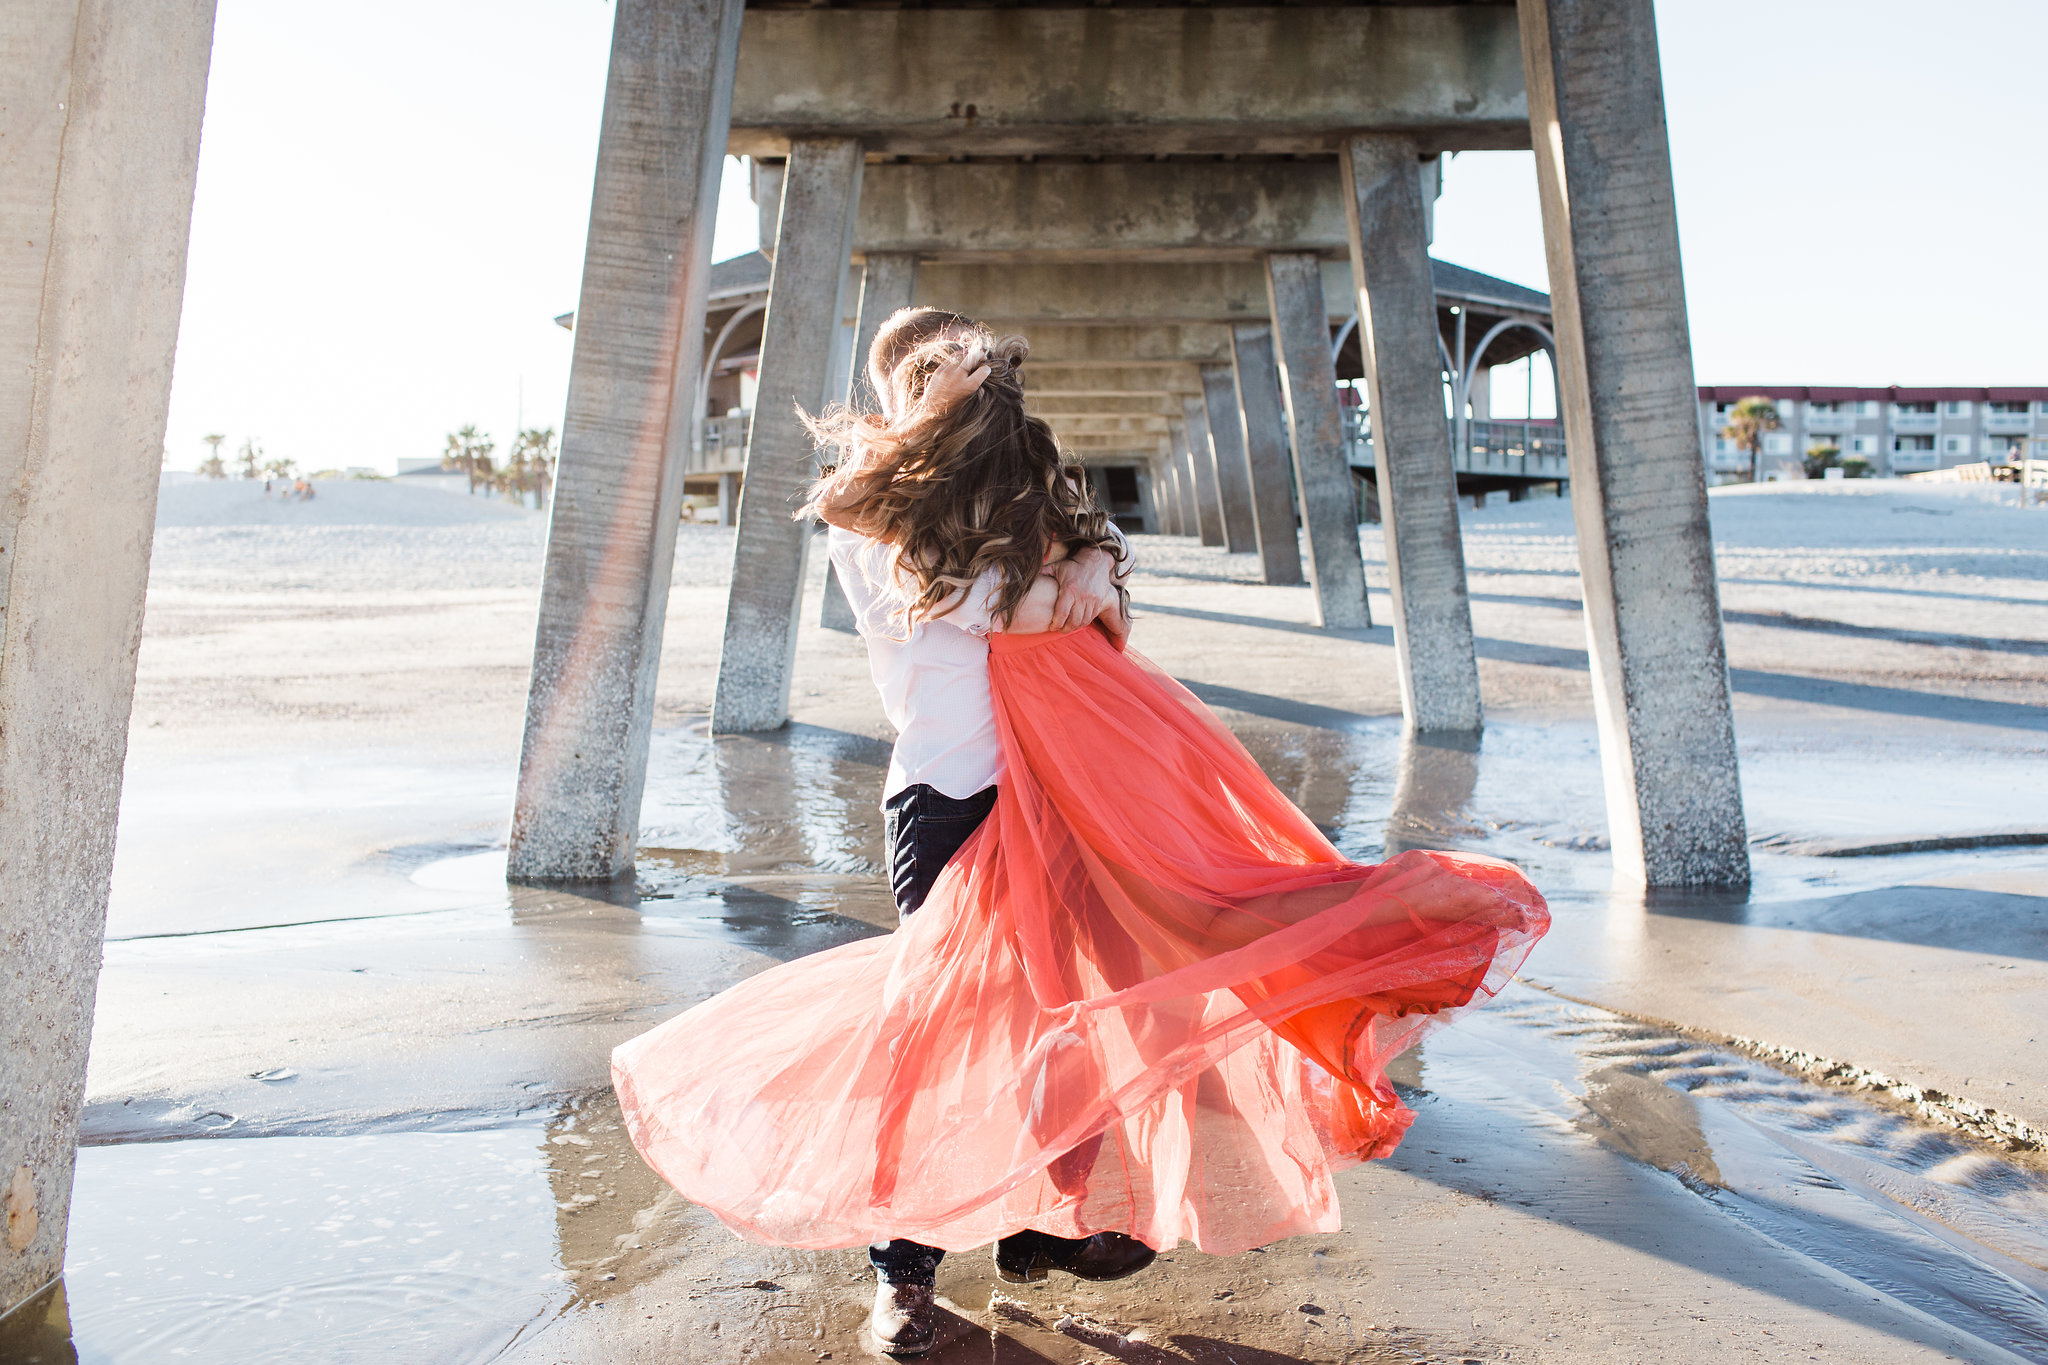 Erin-kevin-apt-b-photography-tybee-island-engagement-photoshoot-savannah-engagement-savannah-wedding-savannah-wedding-photographer-tybee-island-wedding-beach-engagement-tybee-island-pier-15.jpg